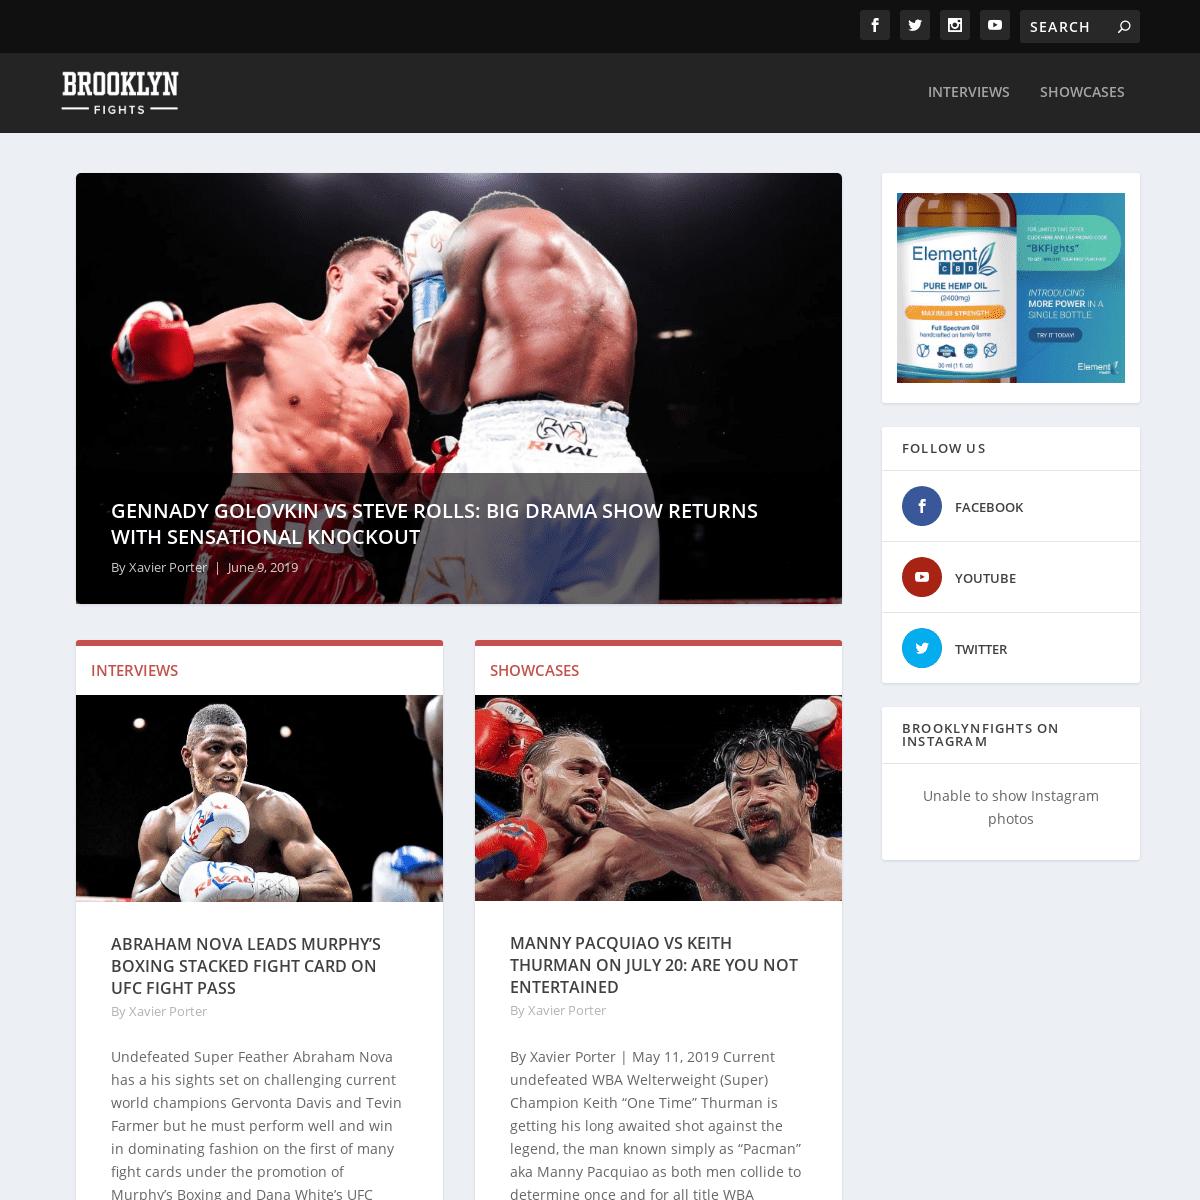 ArchiveBay.com - brooklynfights.com - BrooklynFights - Combat Sports News and Info